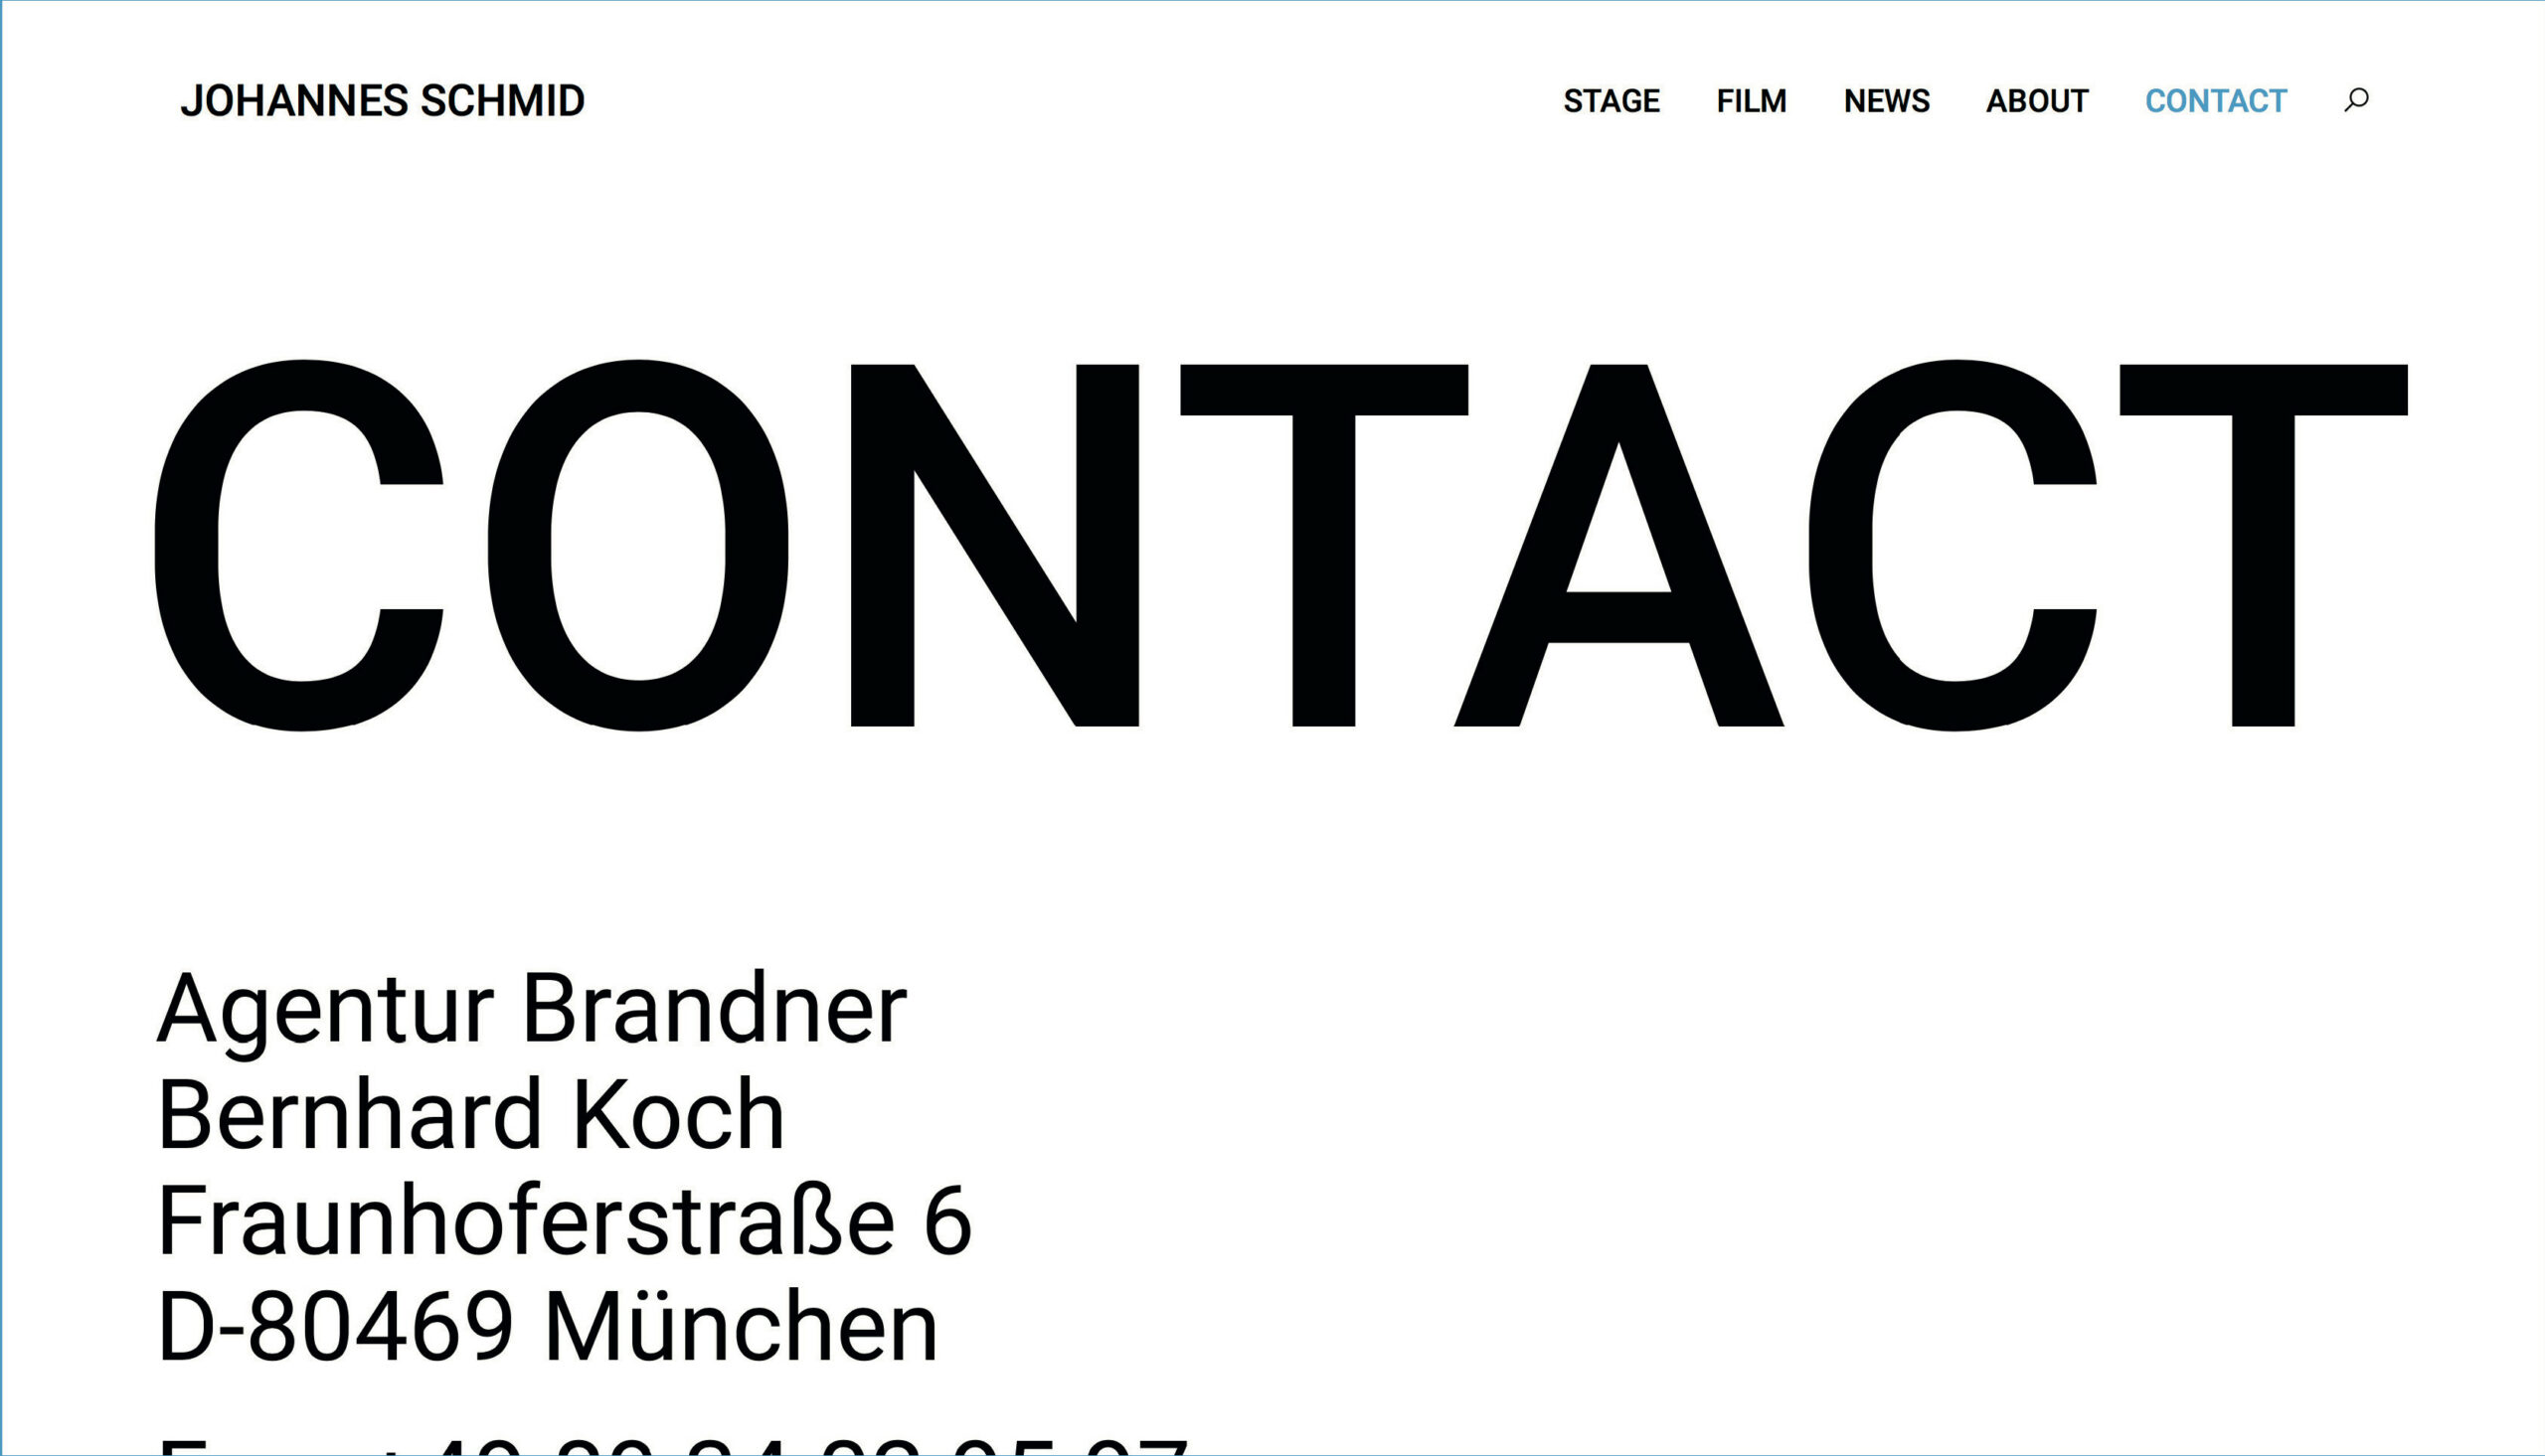 19_2_21_Präsentation_JohannesSchmid_Seite_35-1